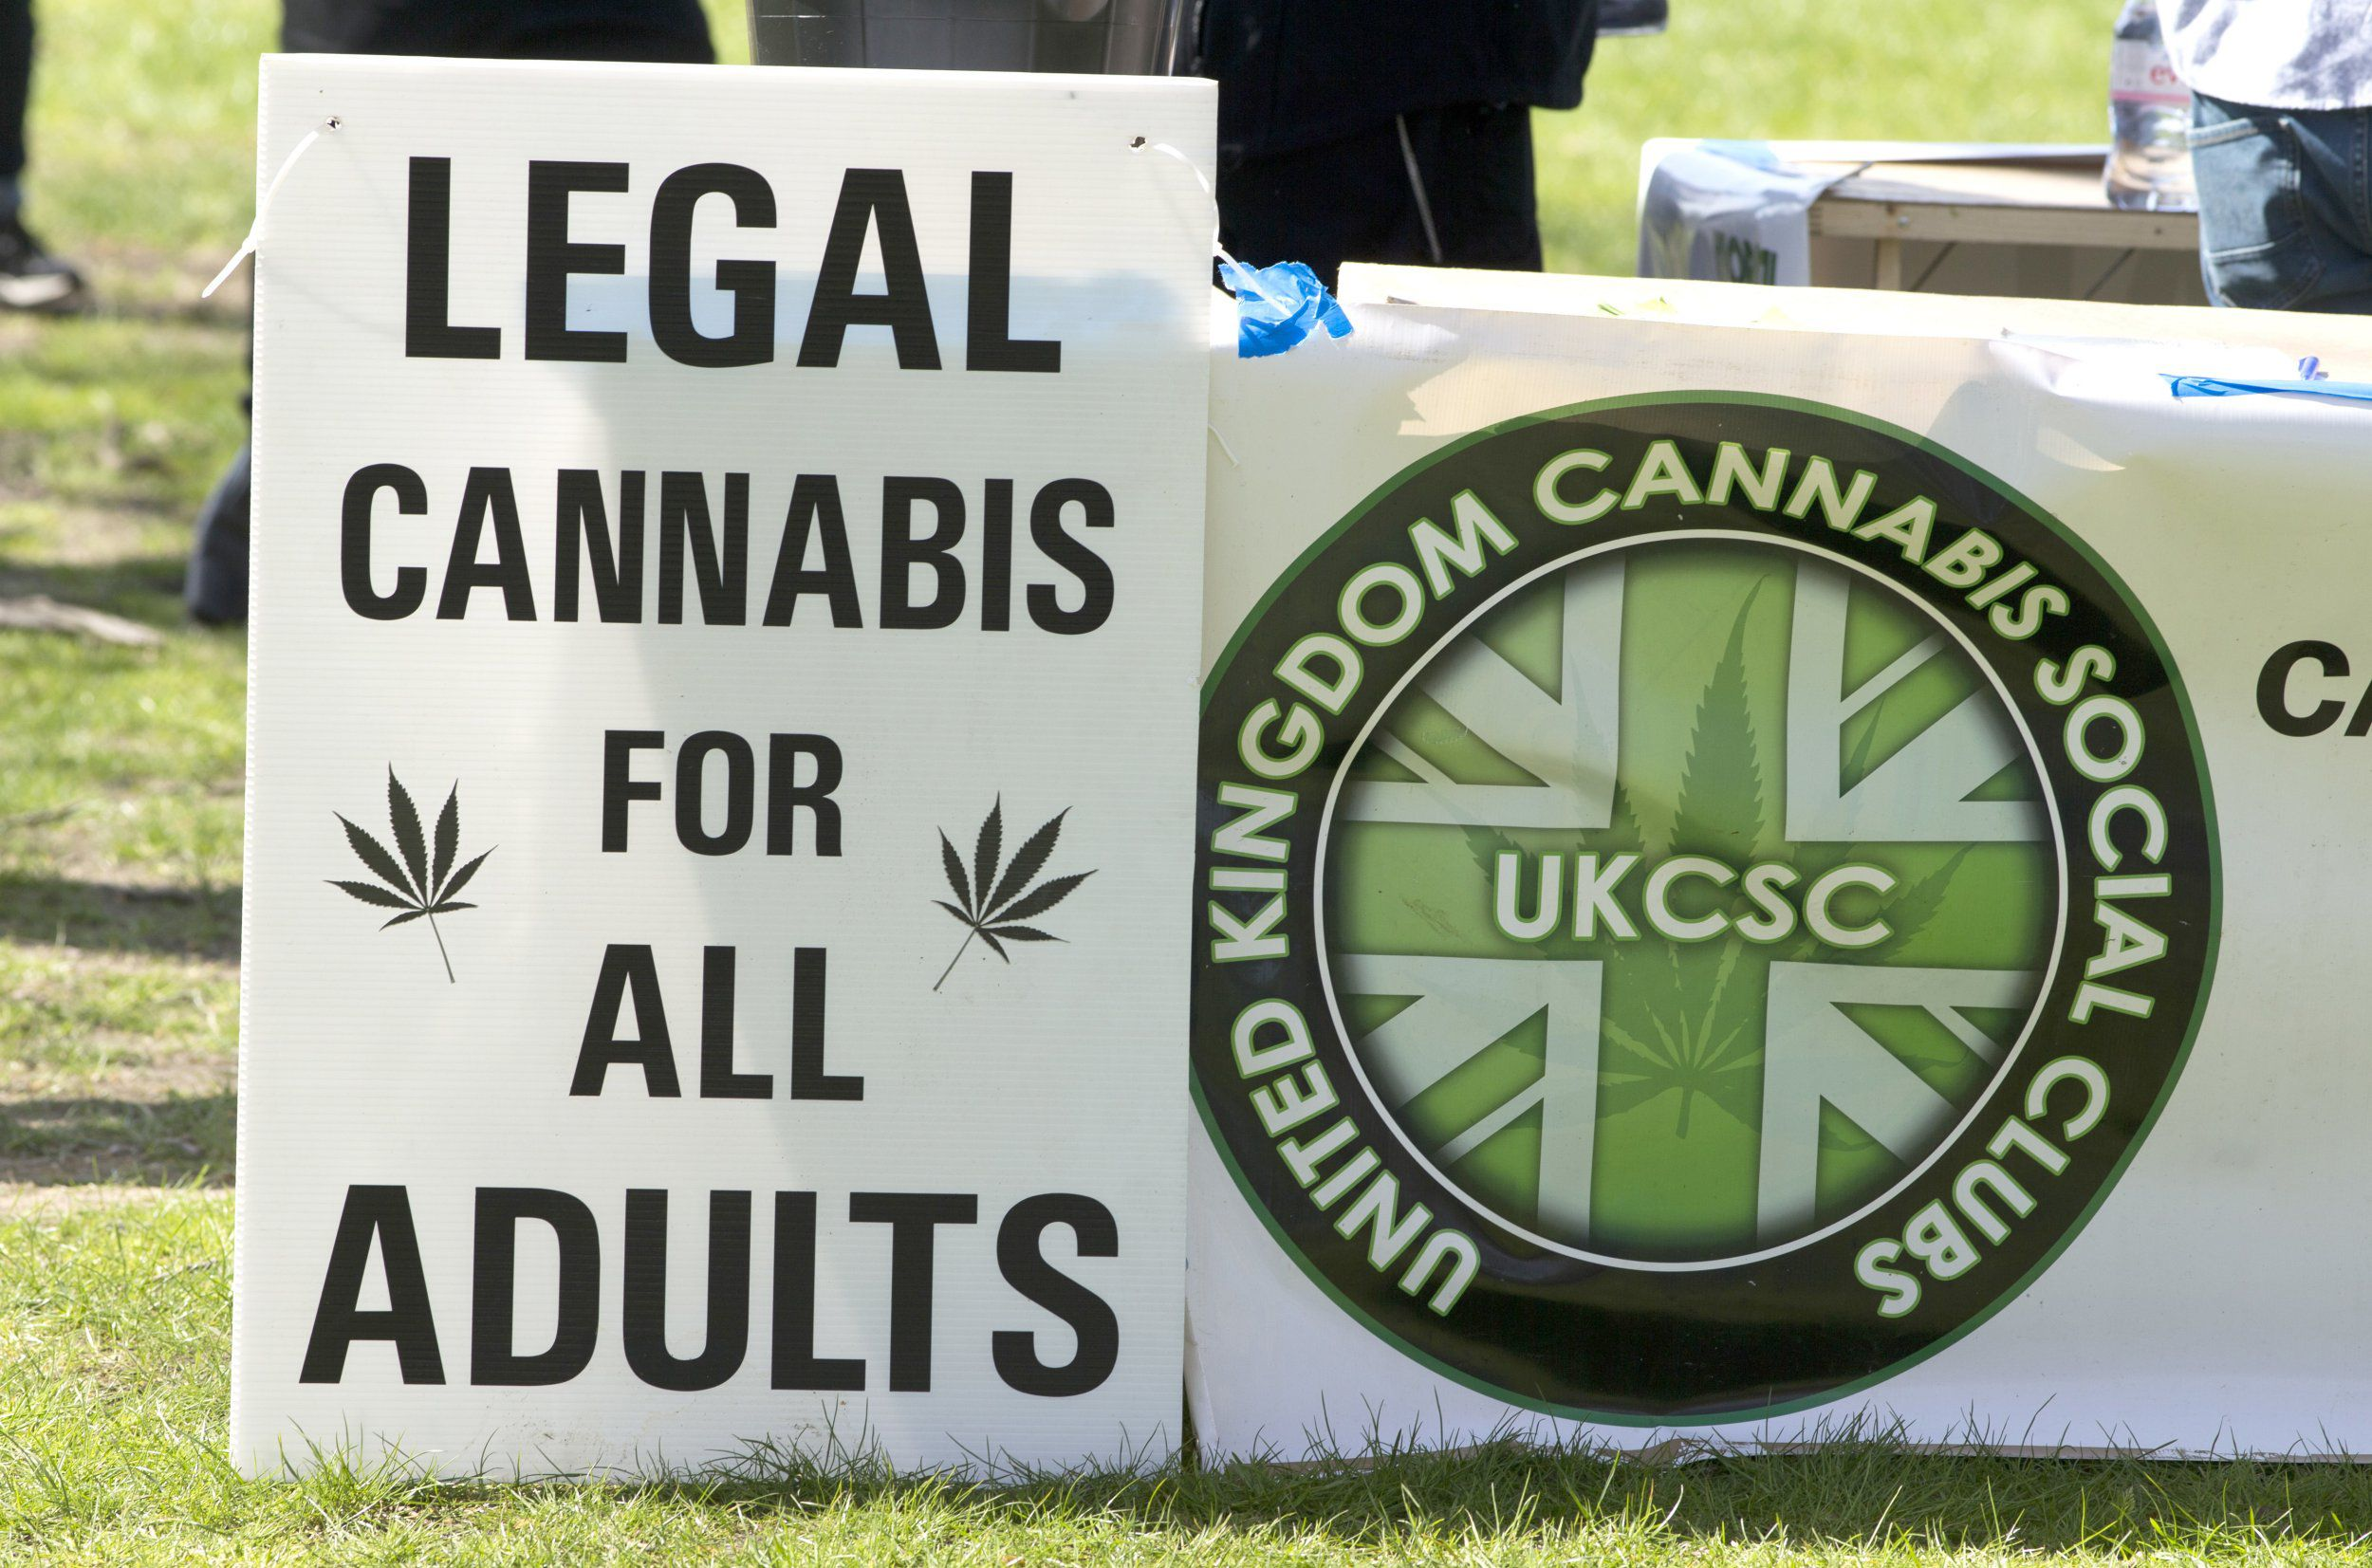 UKCSC Legal Cannabi Sign